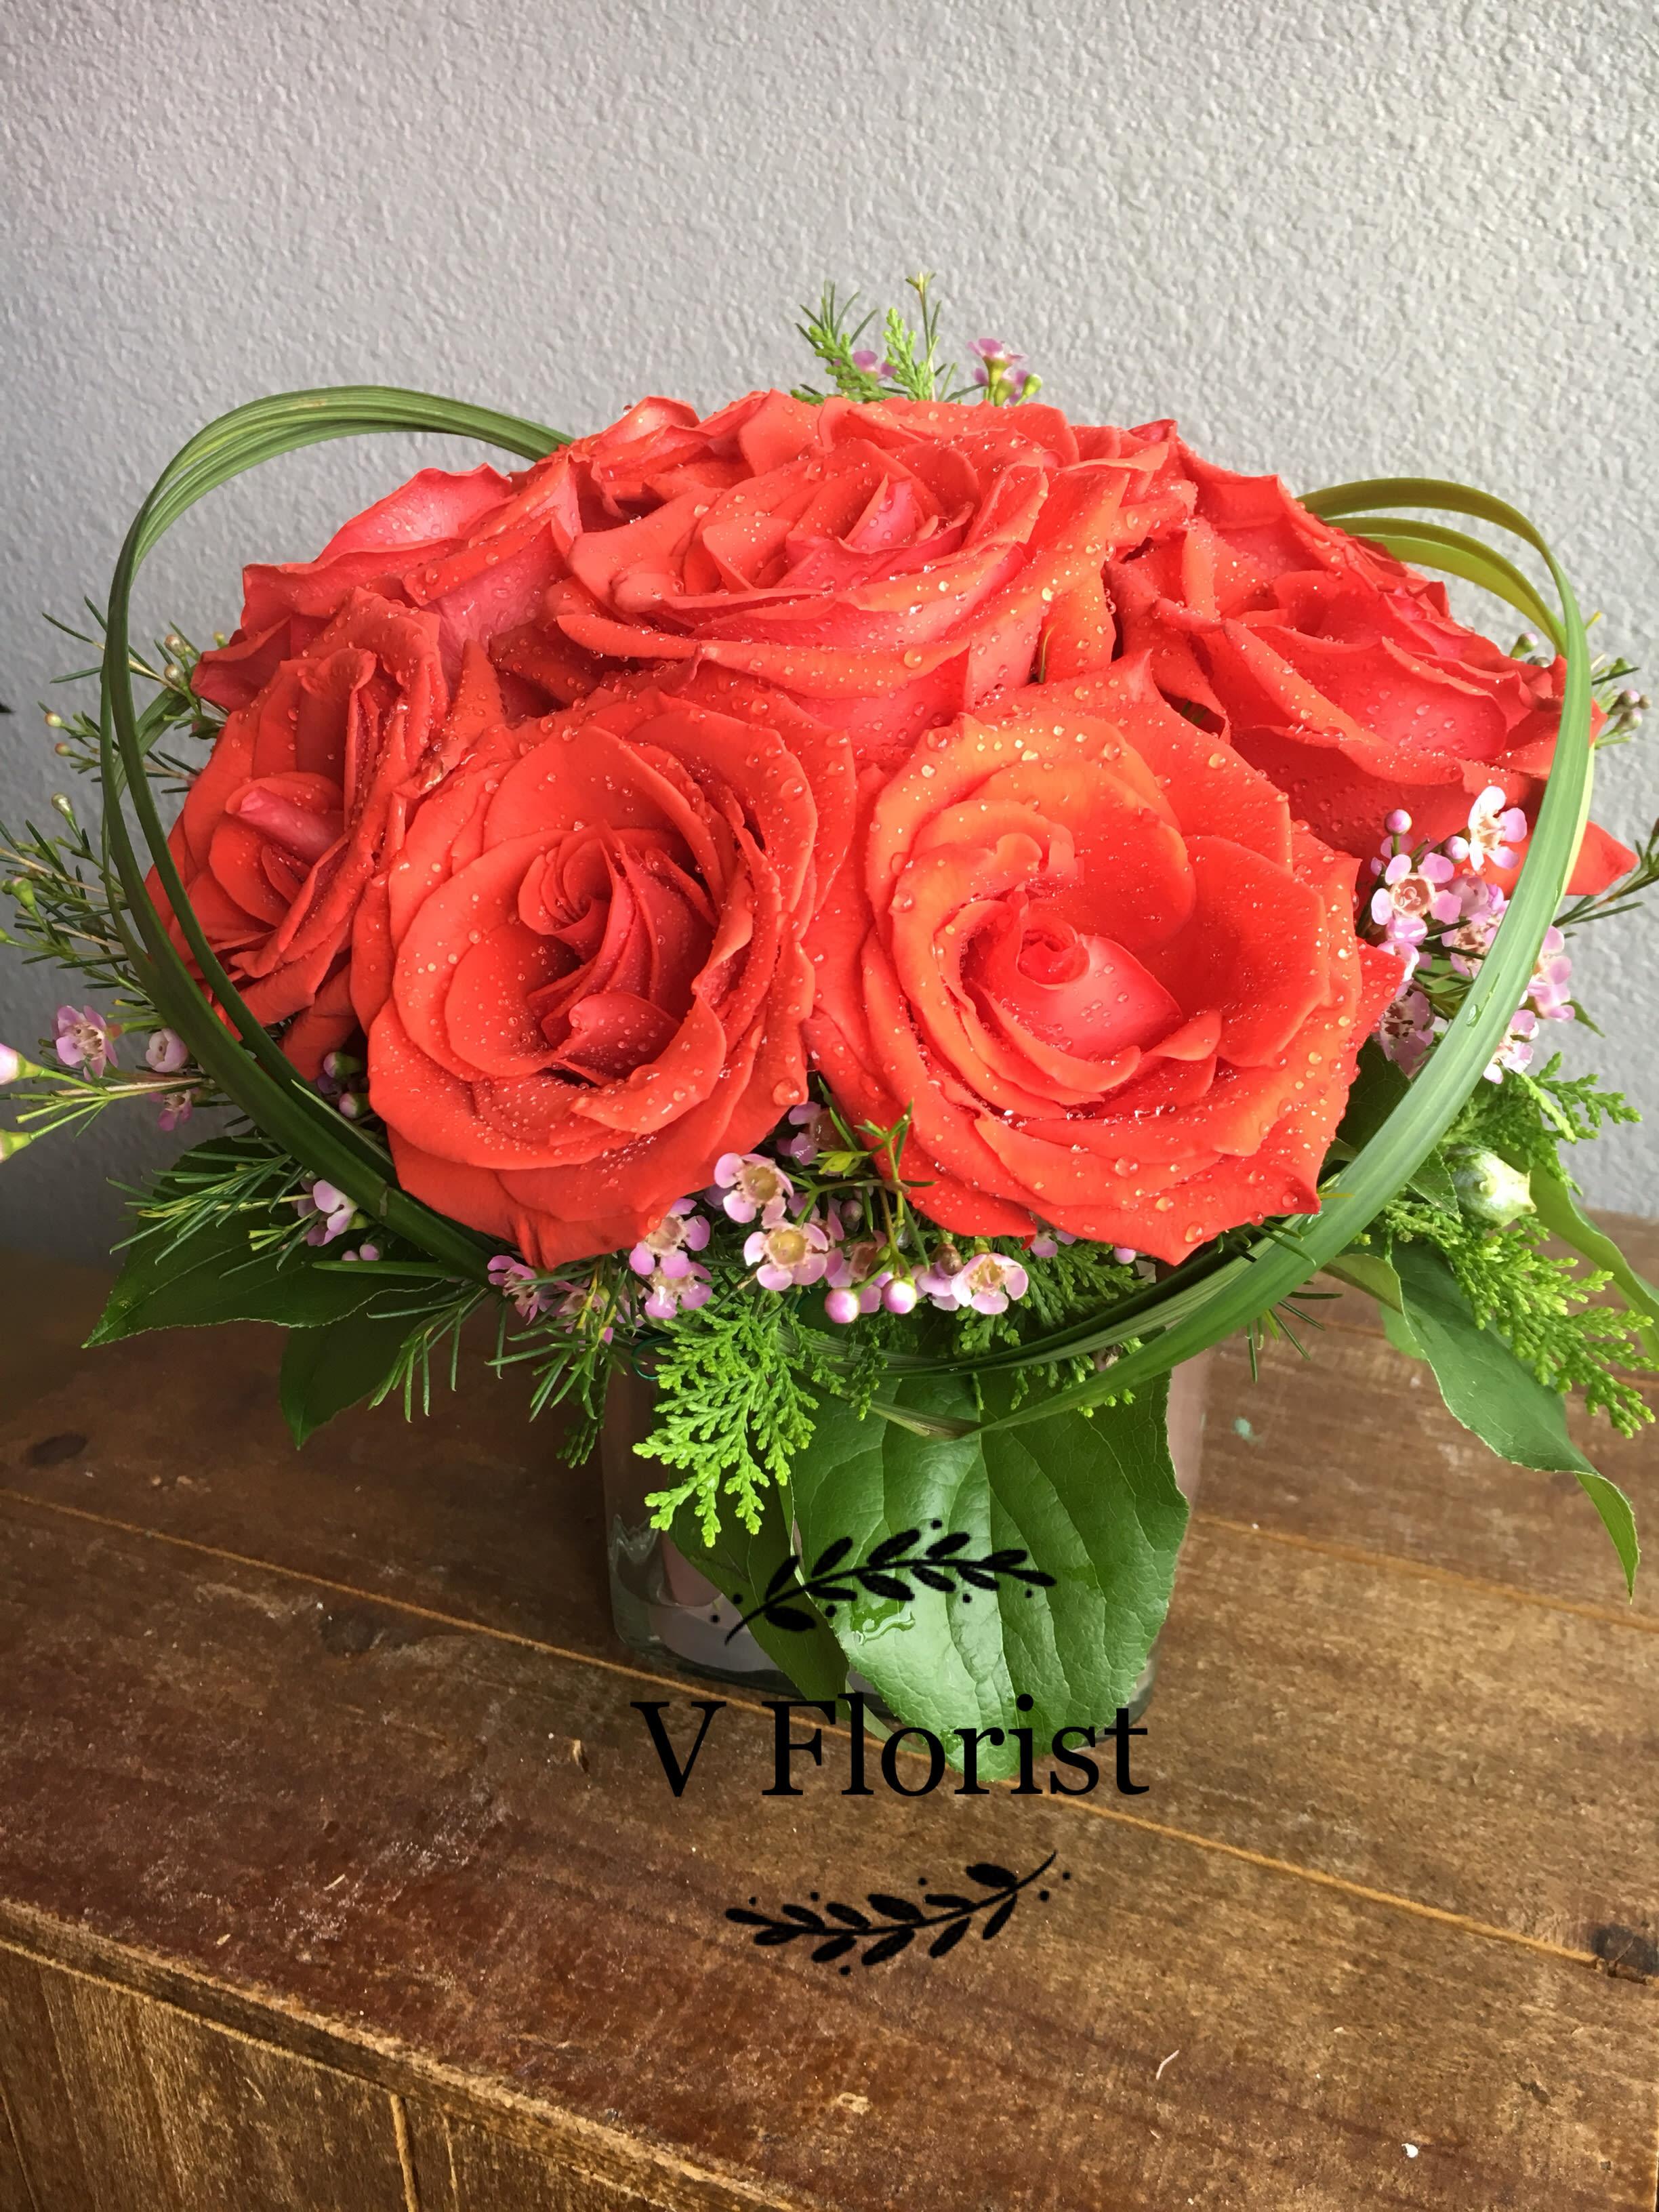 The True Romance Rose Bouquet In Las Vegas Nv V Florist